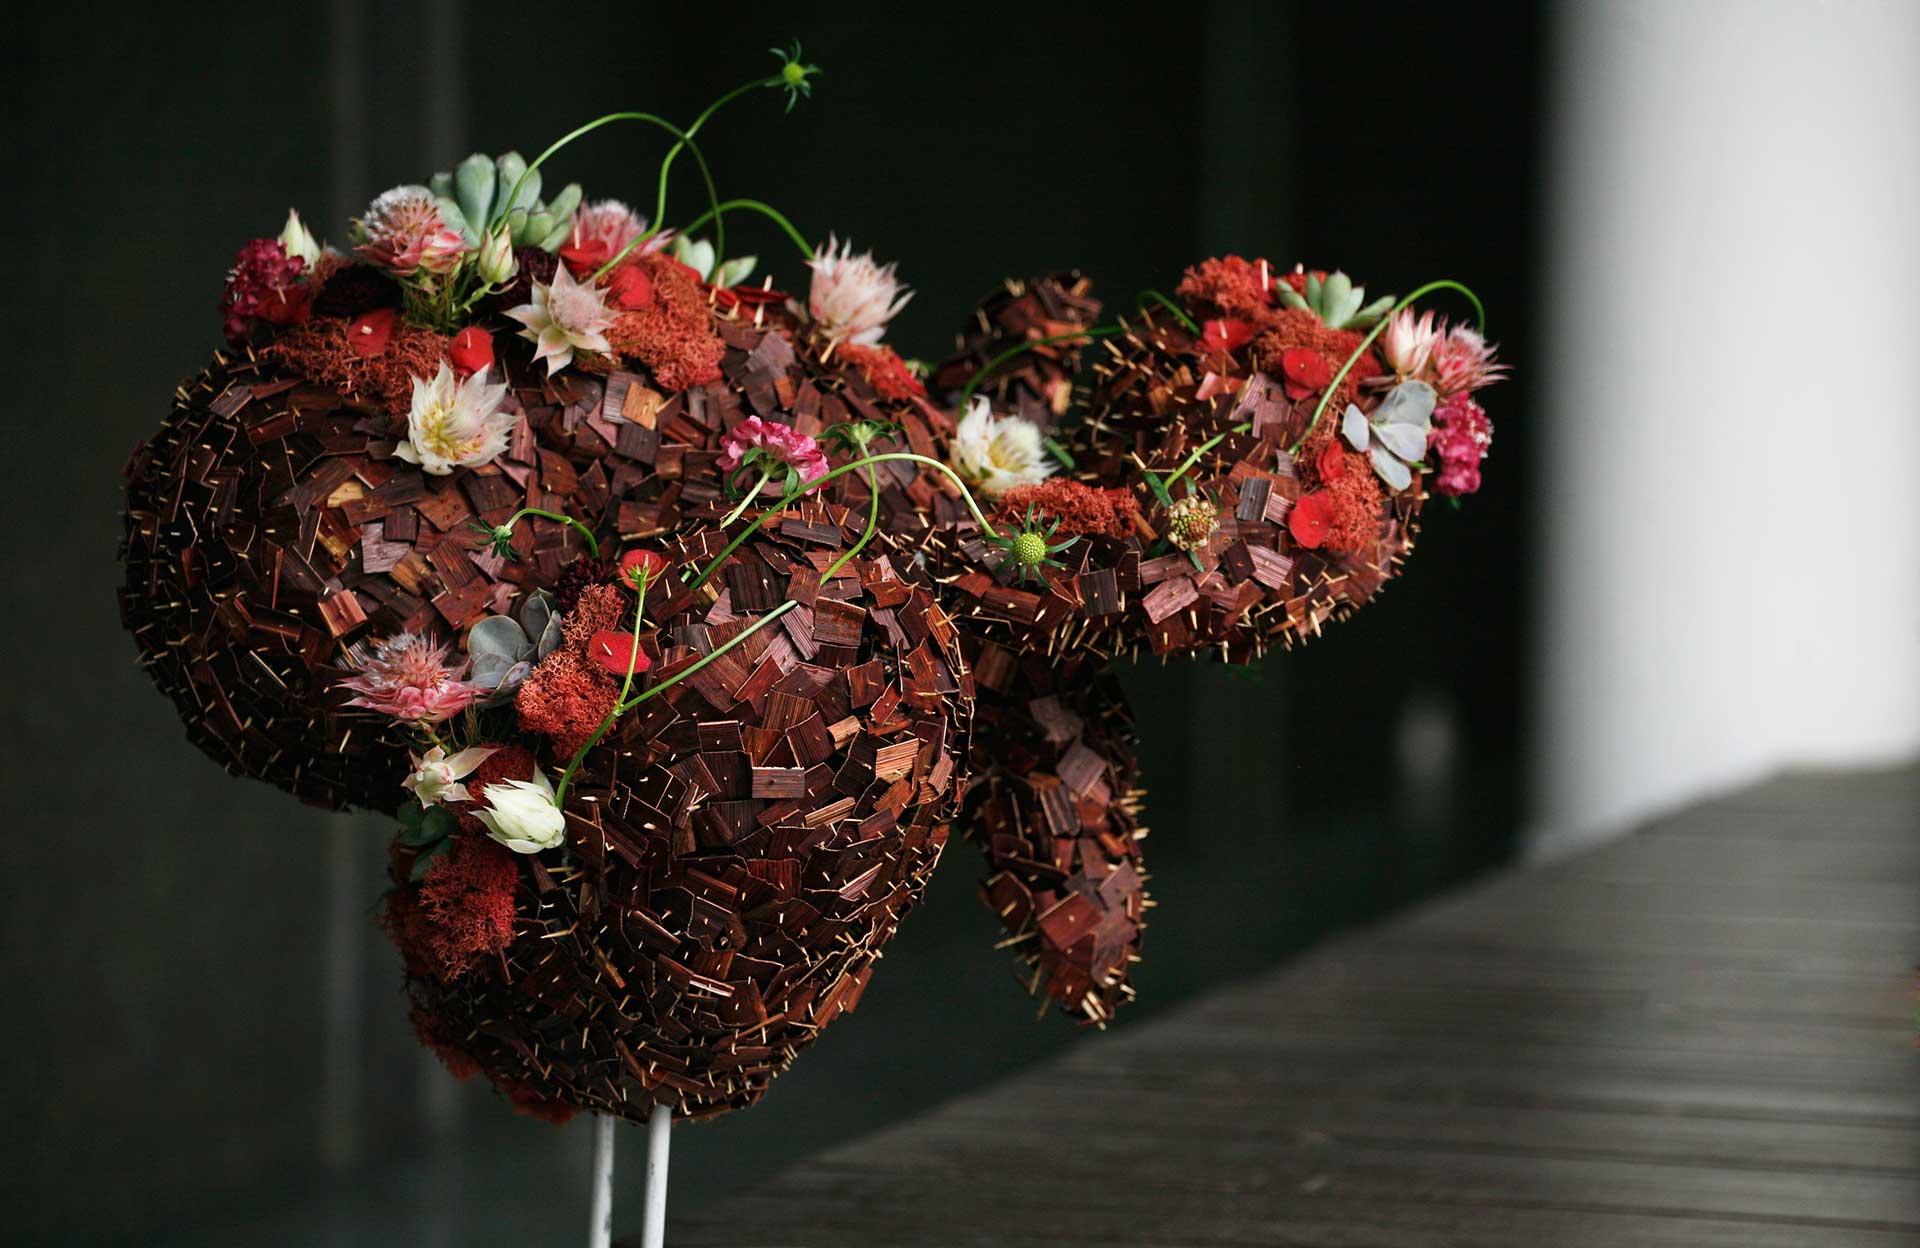 Mazzo Di Fiore Johor Bahru.Mazzo Di Fiore Sending Your Thoughts Through Flowers